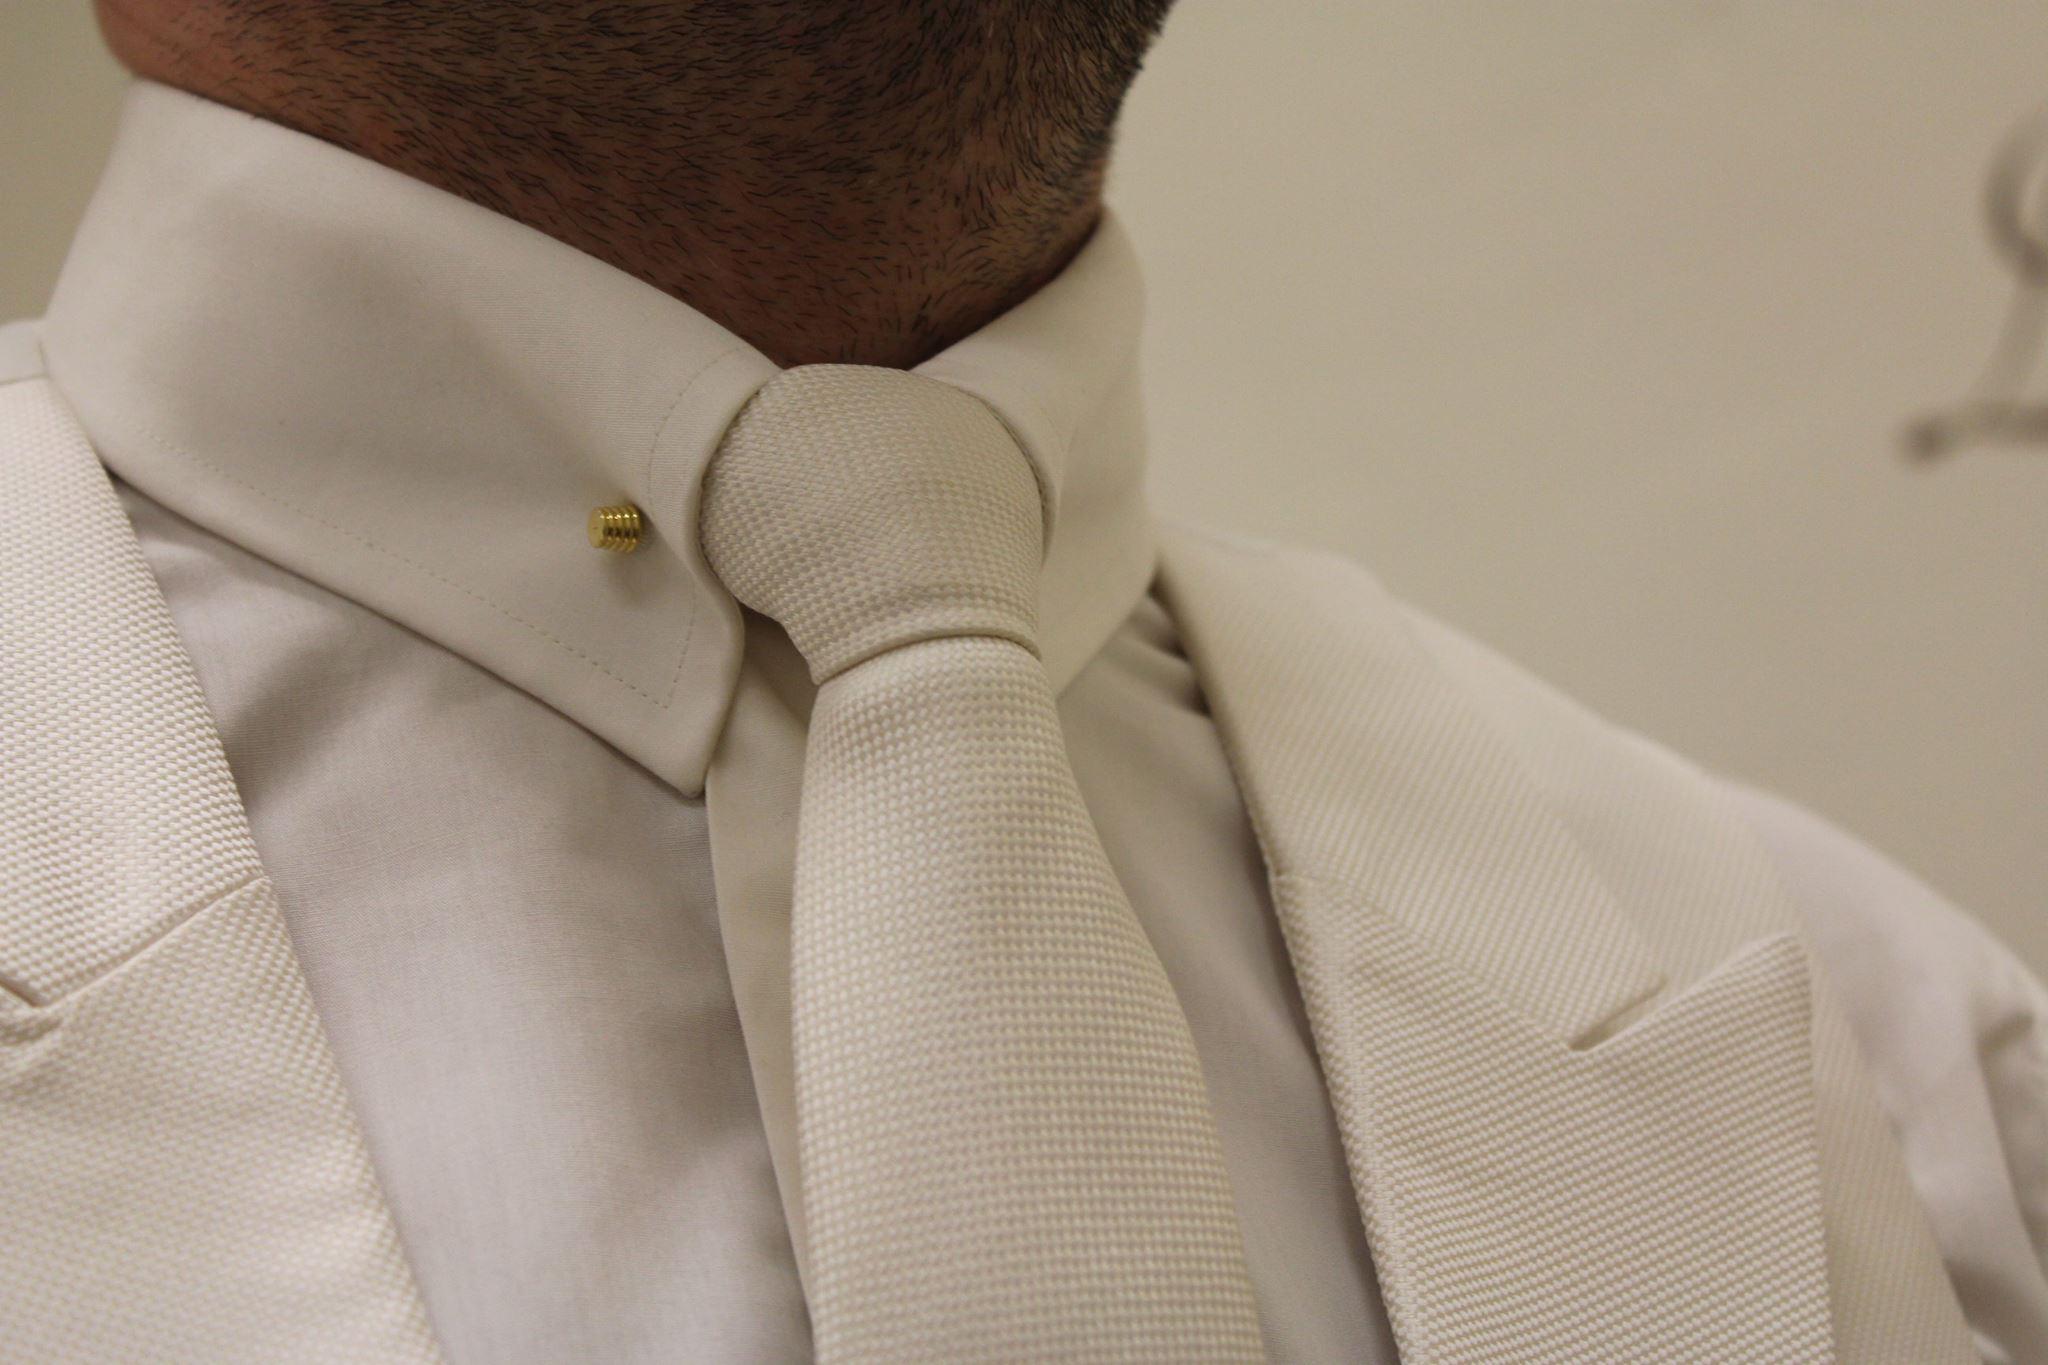 bespoke groom shirt in kent